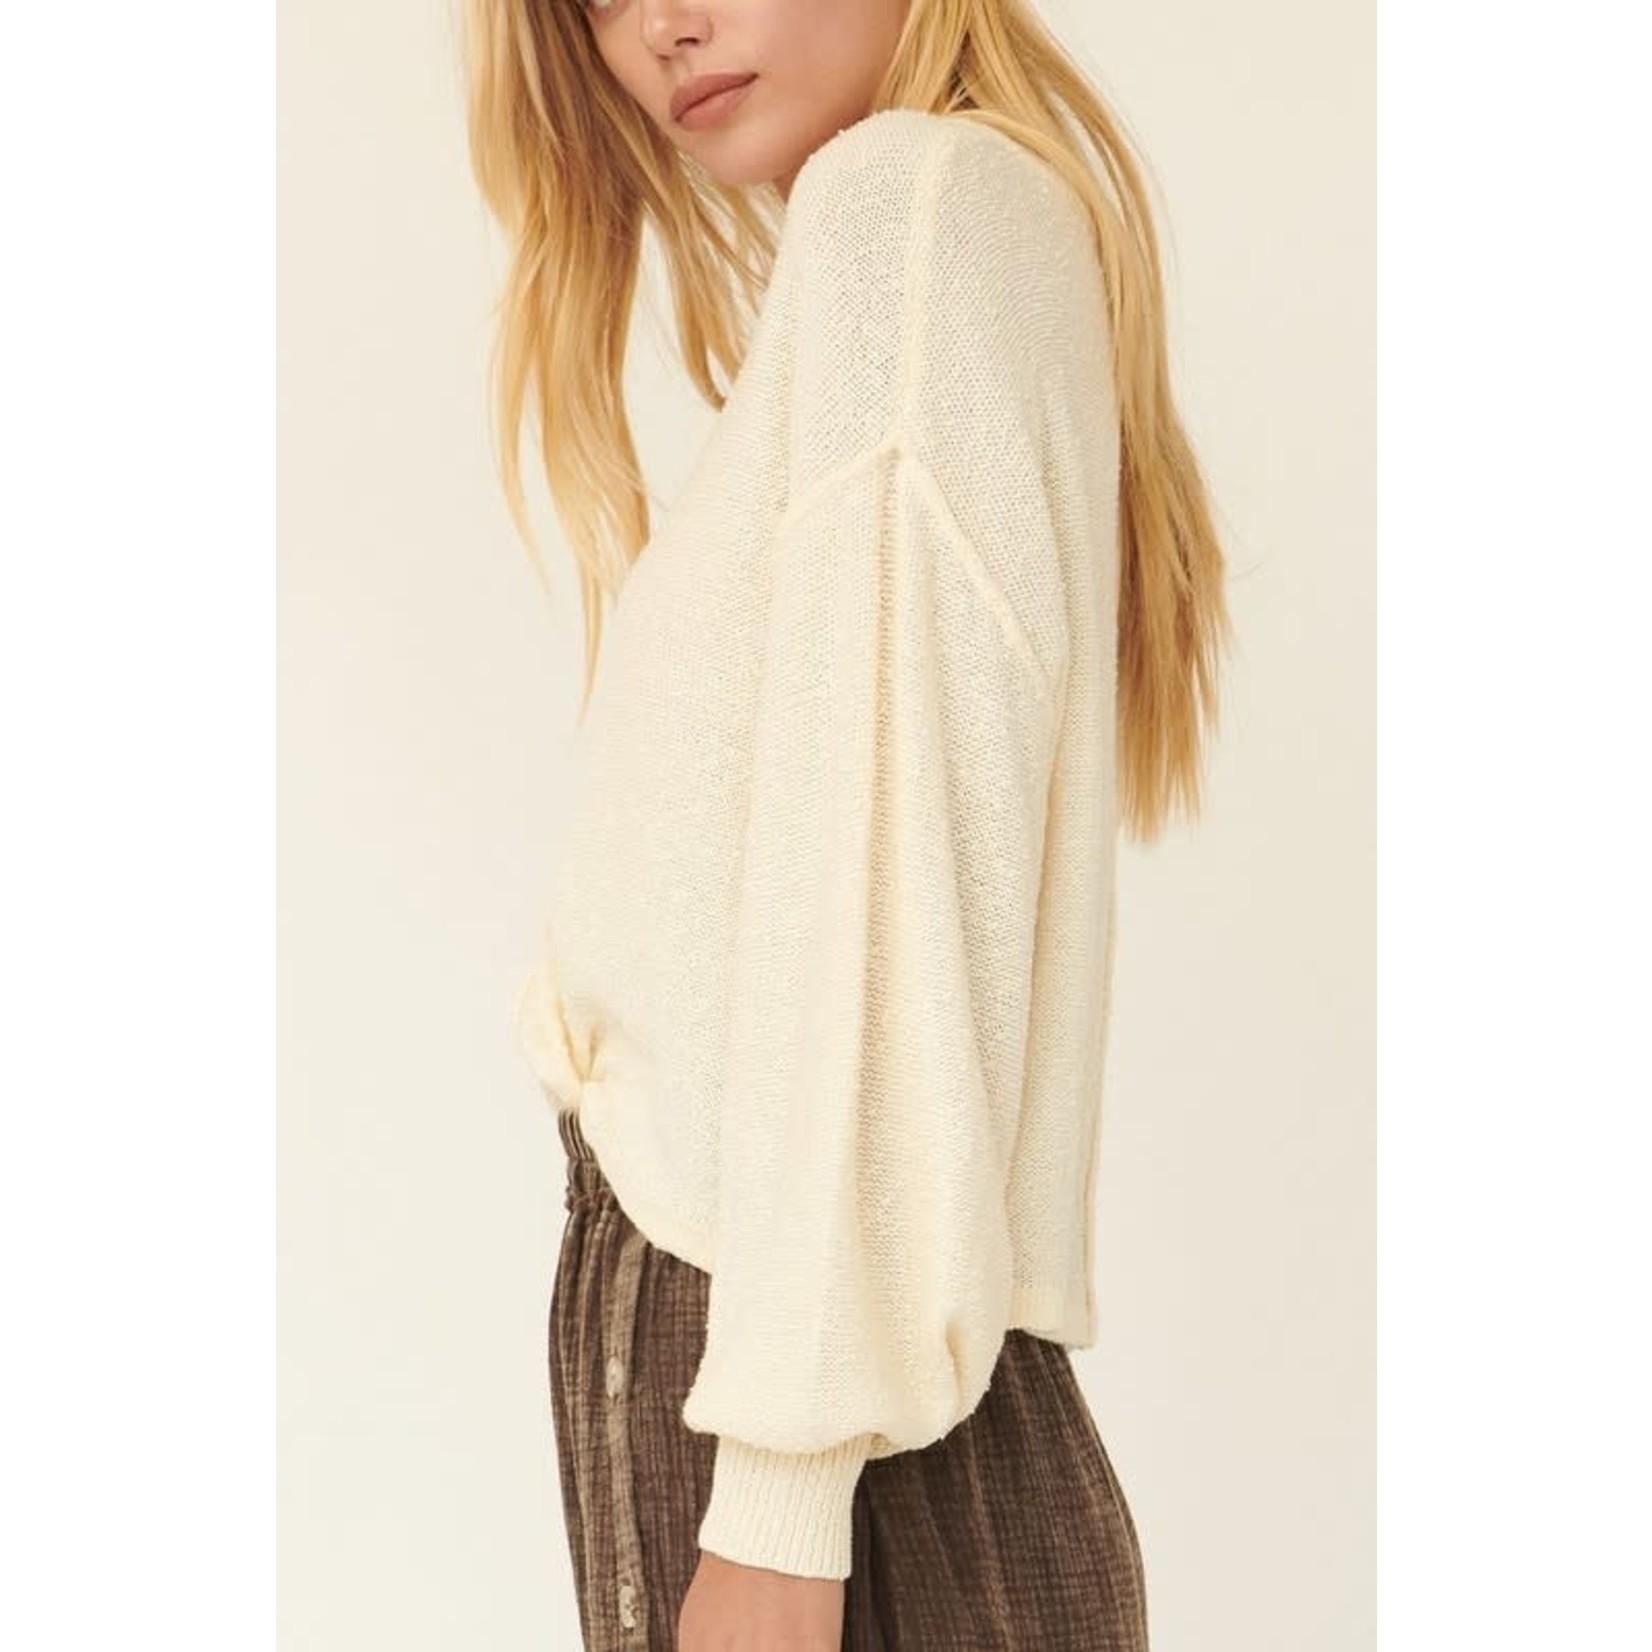 EM & ELLE Knox Loose Textured Sweater